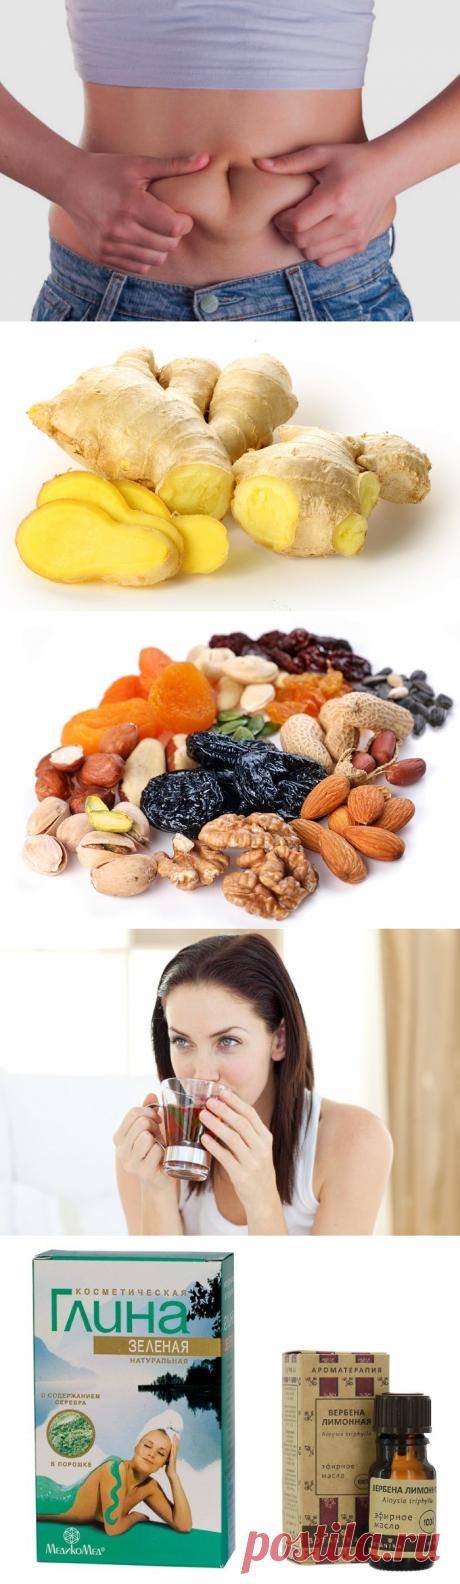 Маски от жира на животе в домашних условиях: жиросжигающие рецепты